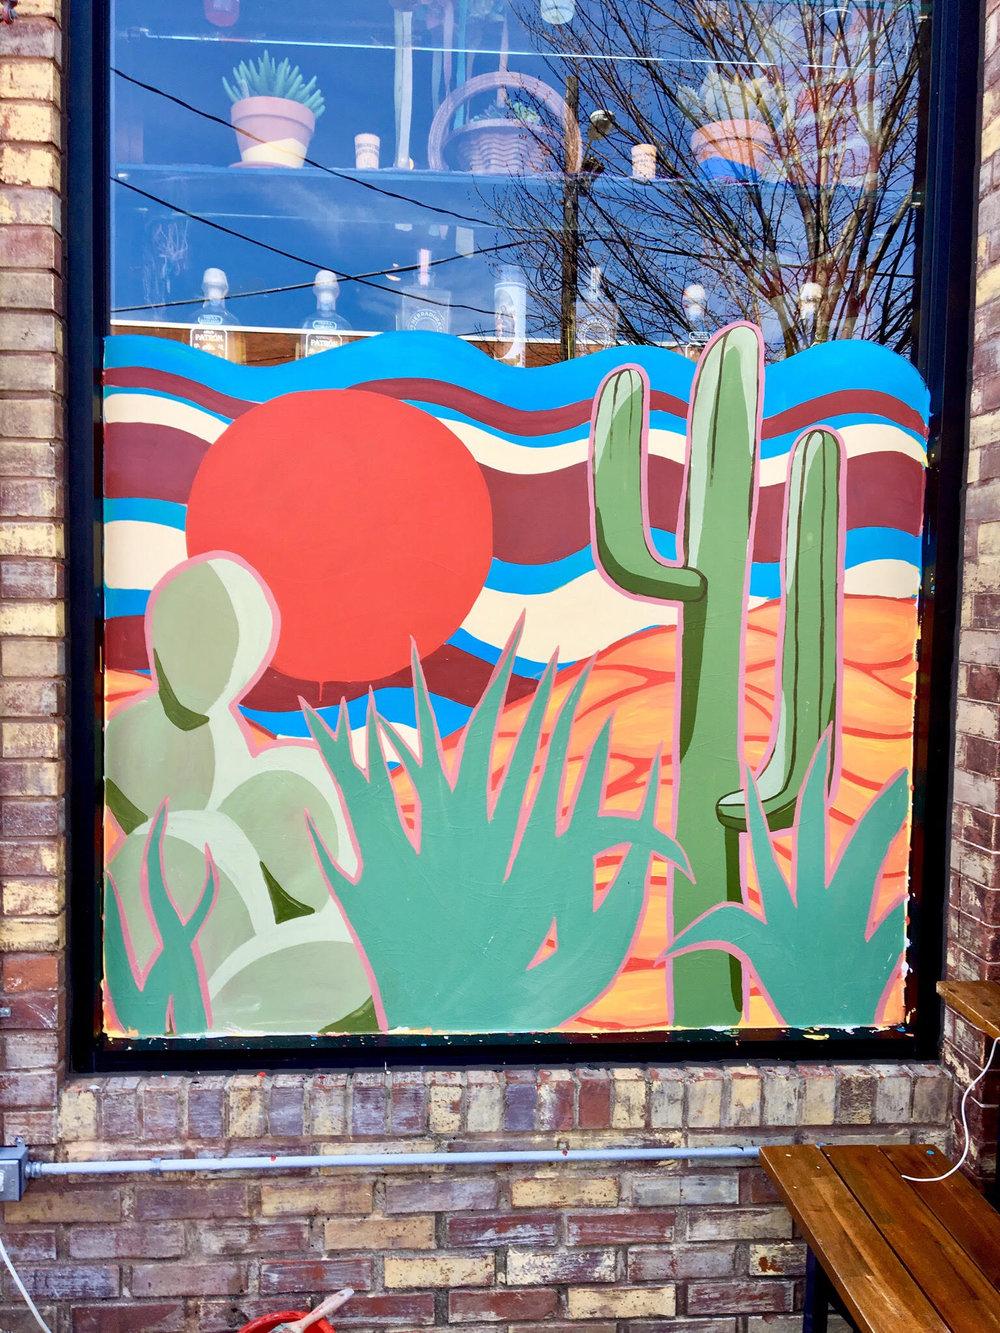 Loteria - Asbury Park, New Jersey